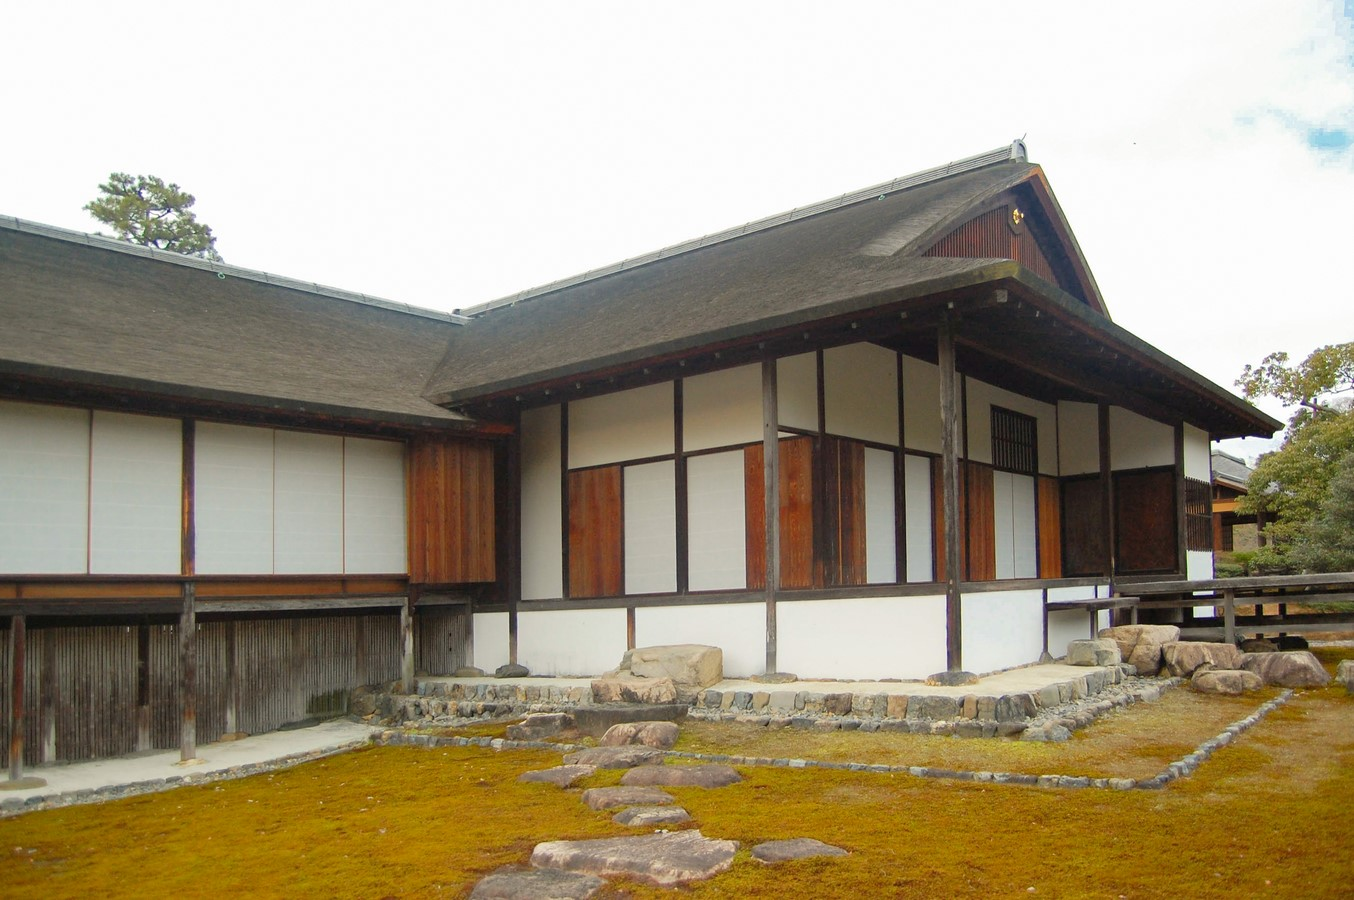 Shoin-zukuri Architecture: Japanese residential architecture - Sheet5